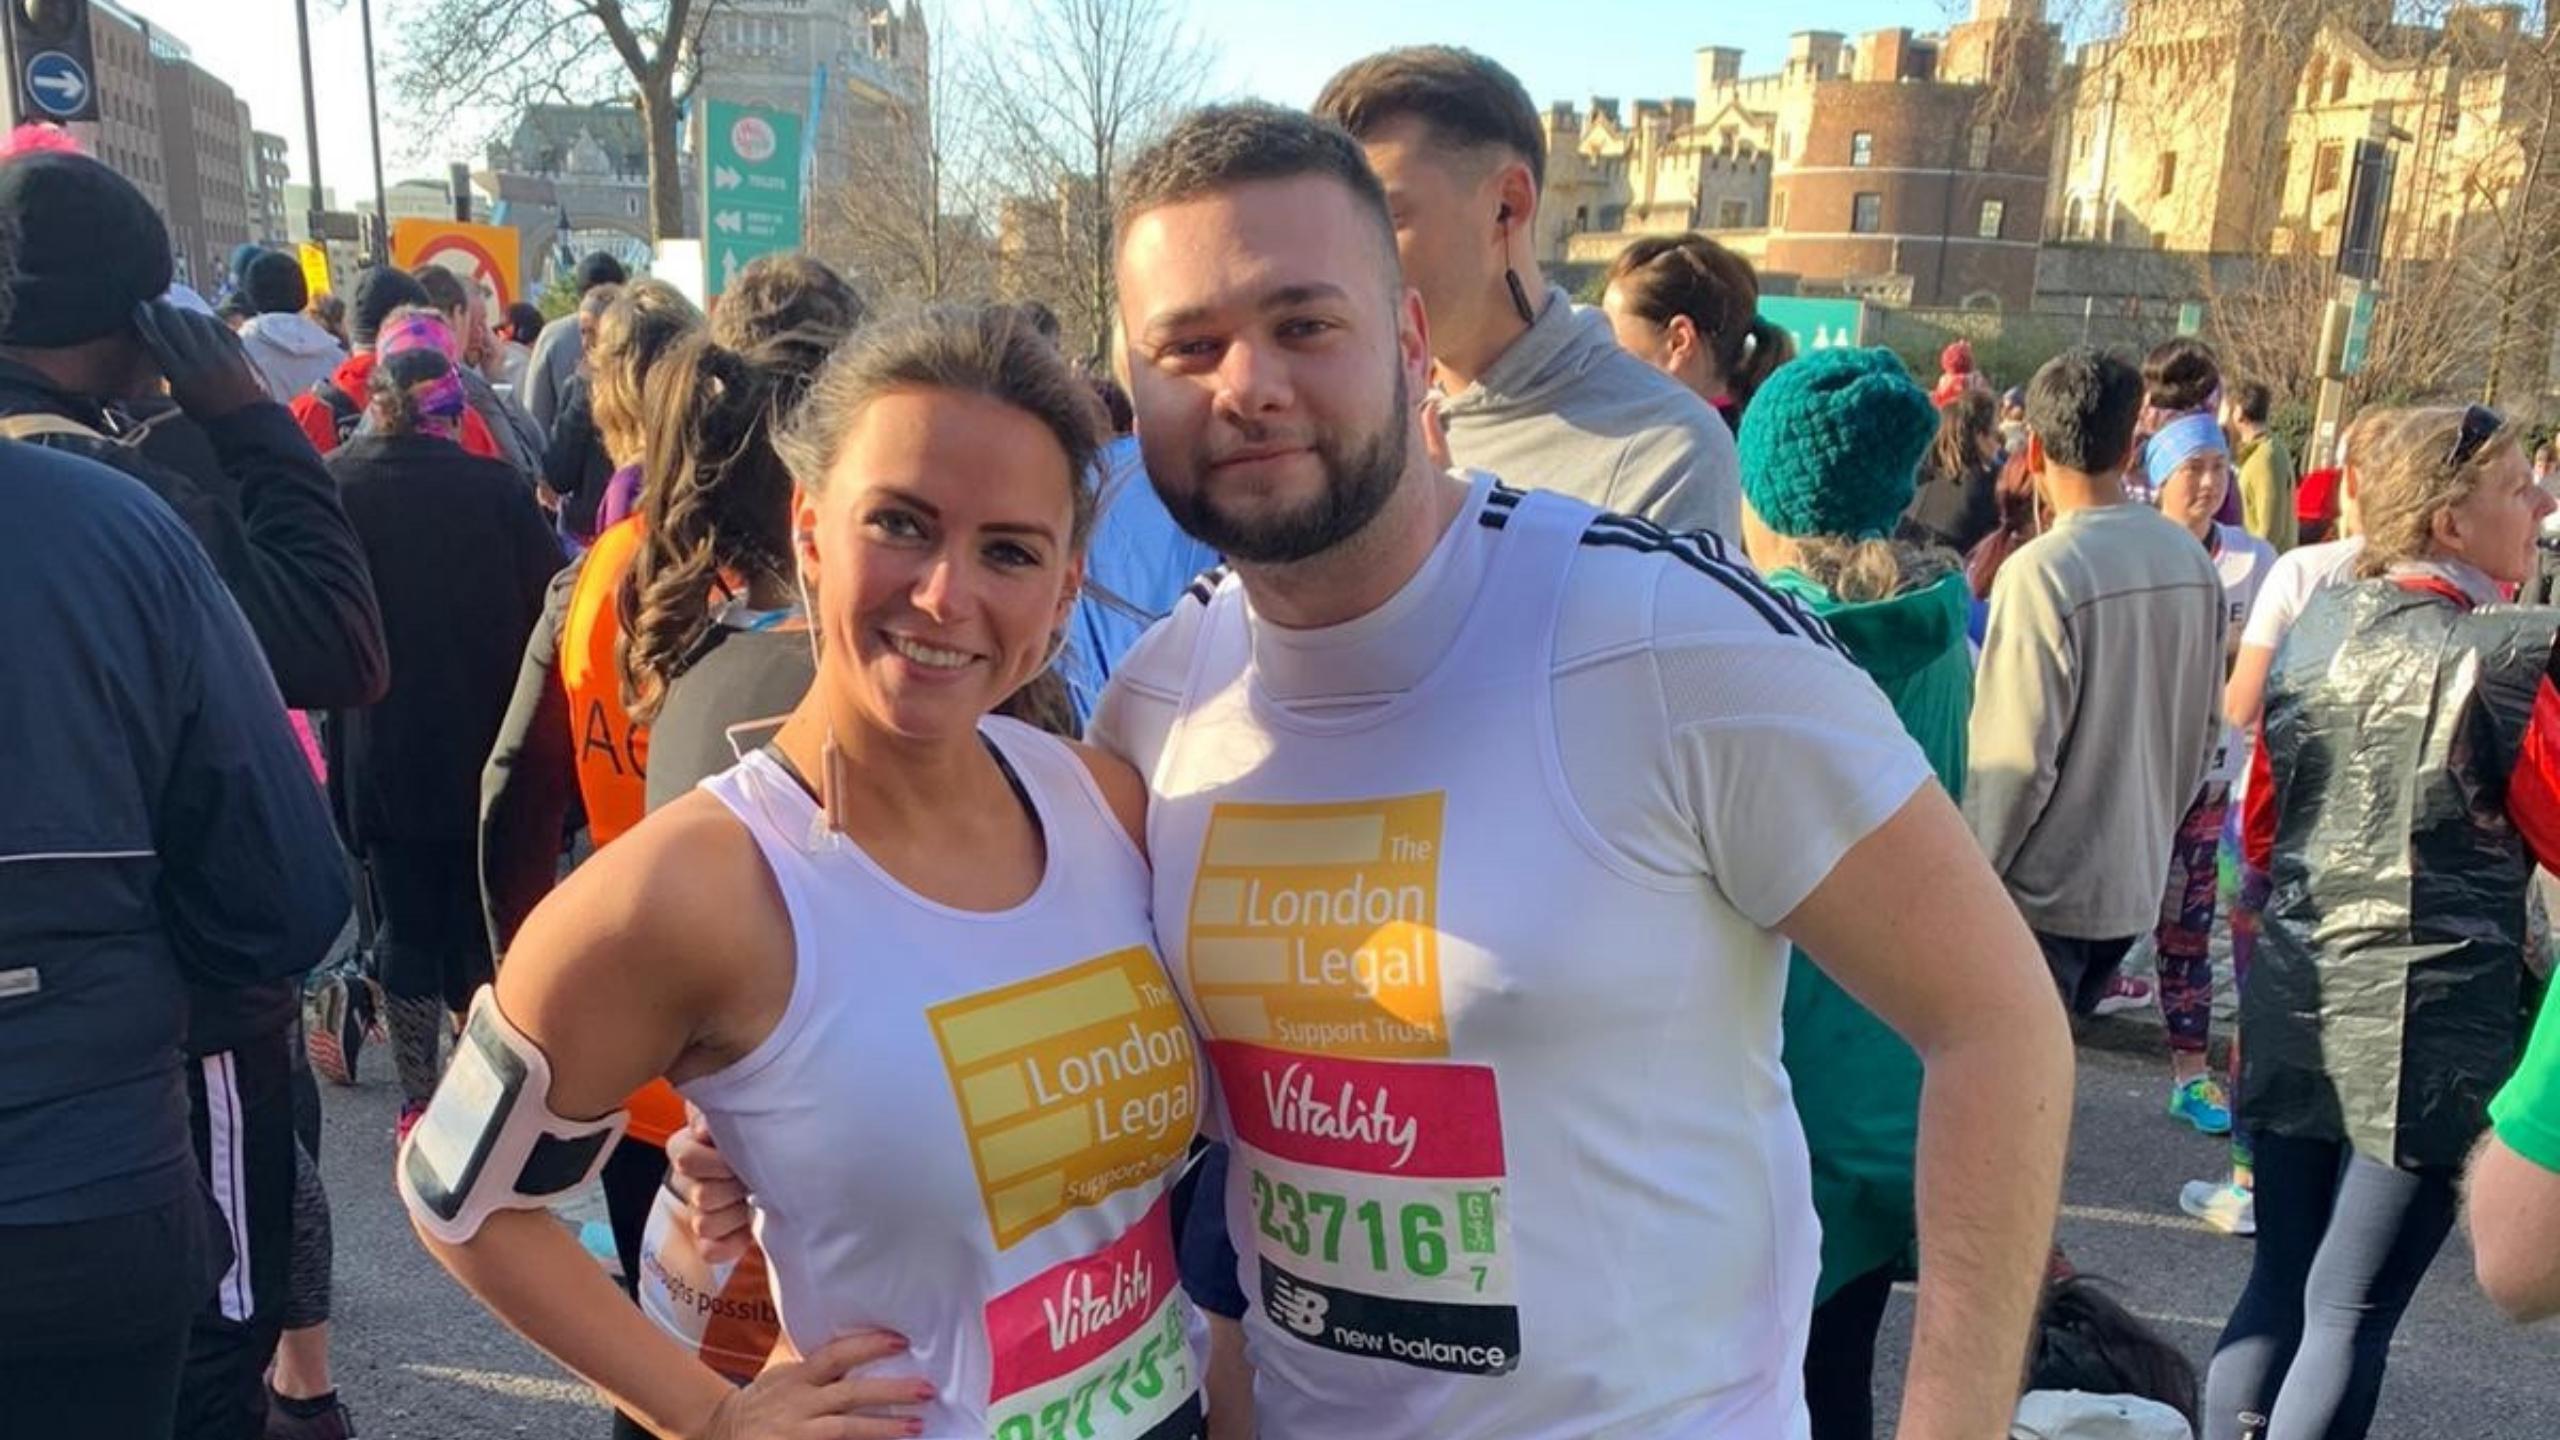 Olivia-May Appleby and Joshua Purser prepare to take on the Brighton Marathon